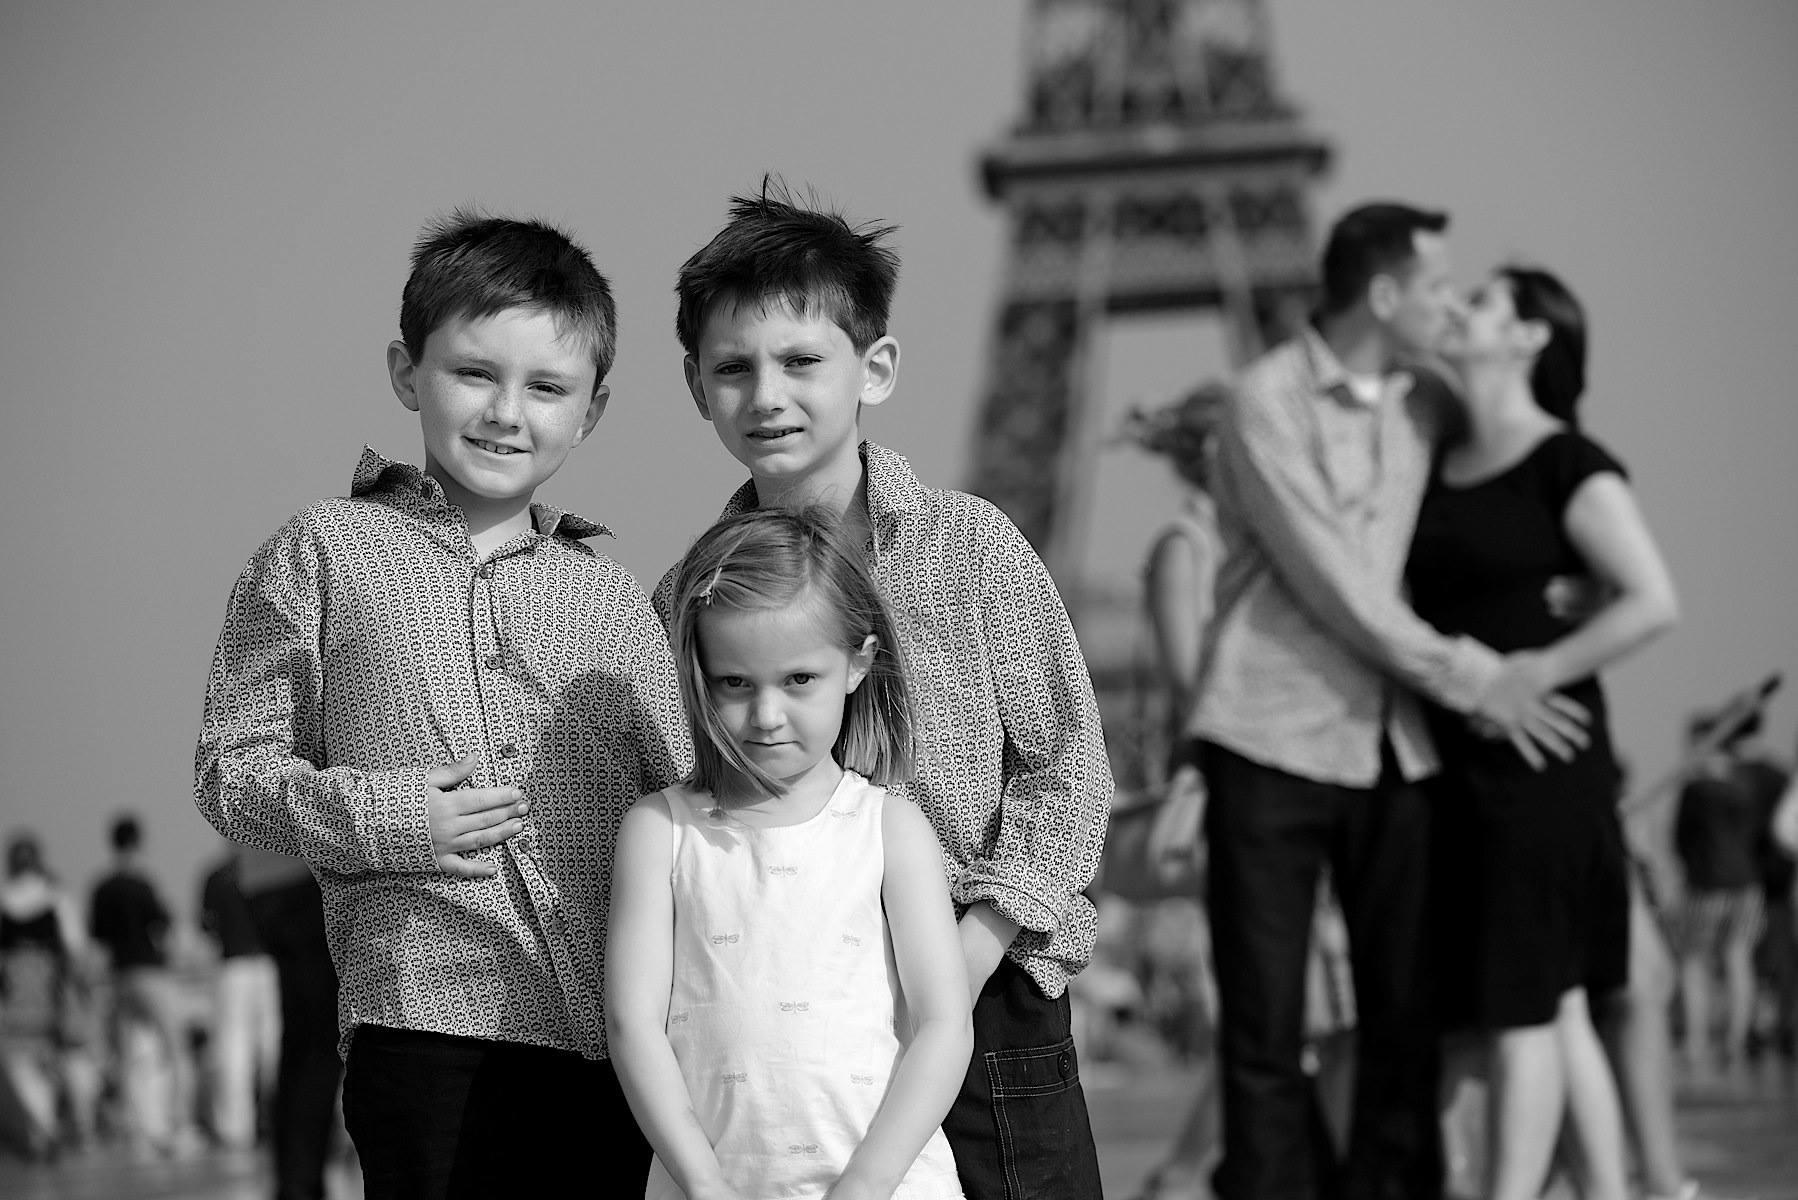 Family picture Paris